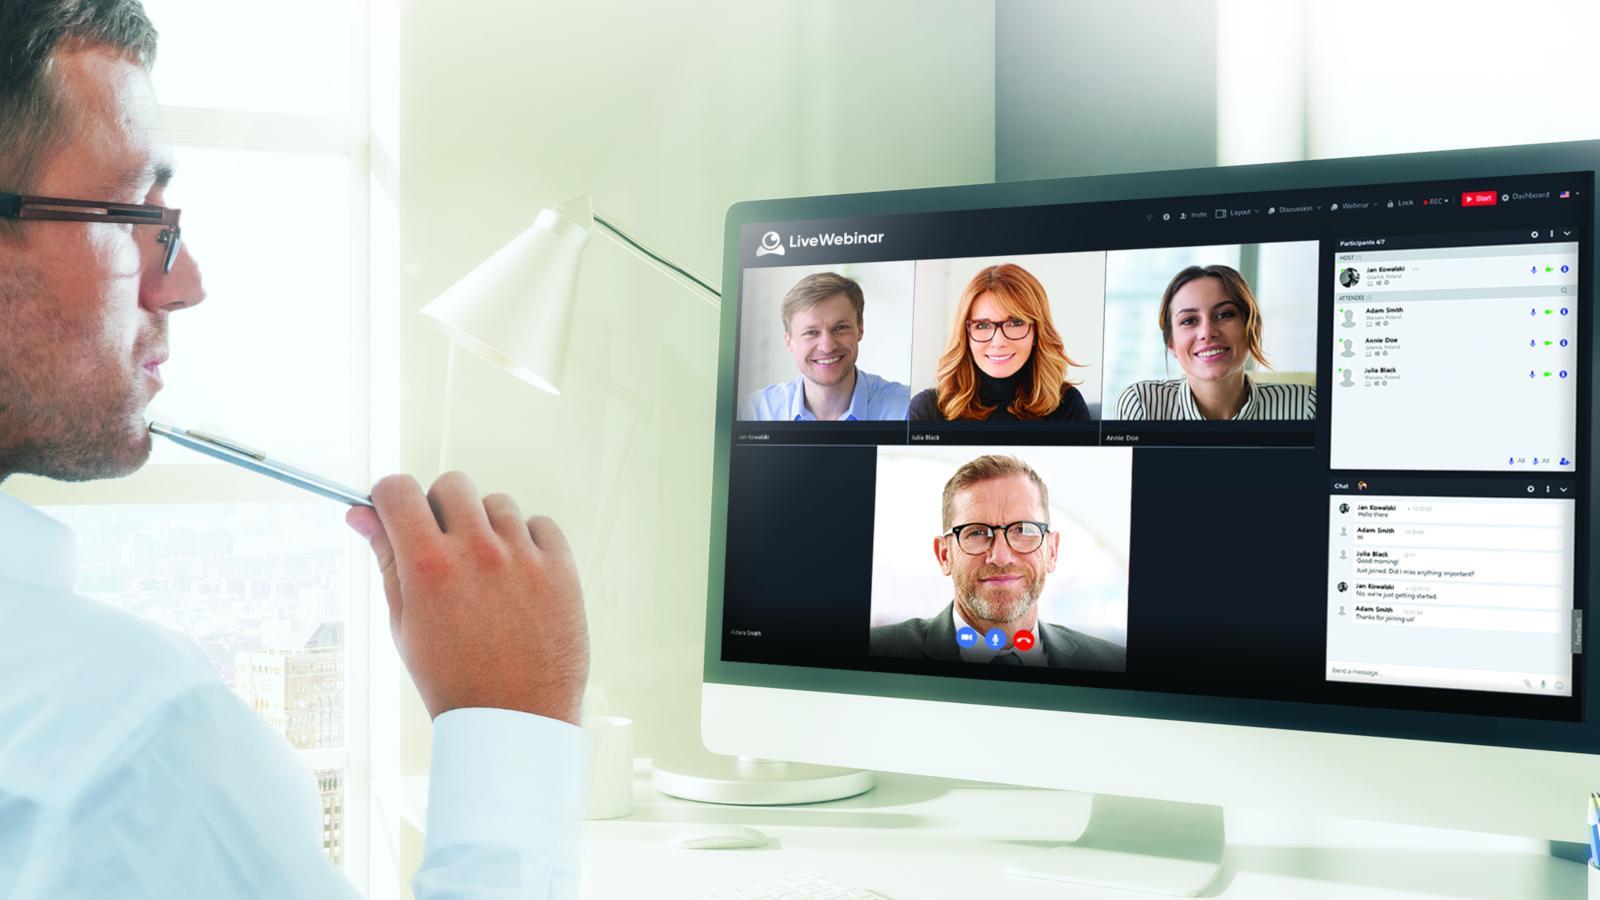 Review LiveWebinar: The most advanced and customizable webinar platform - Appvizer